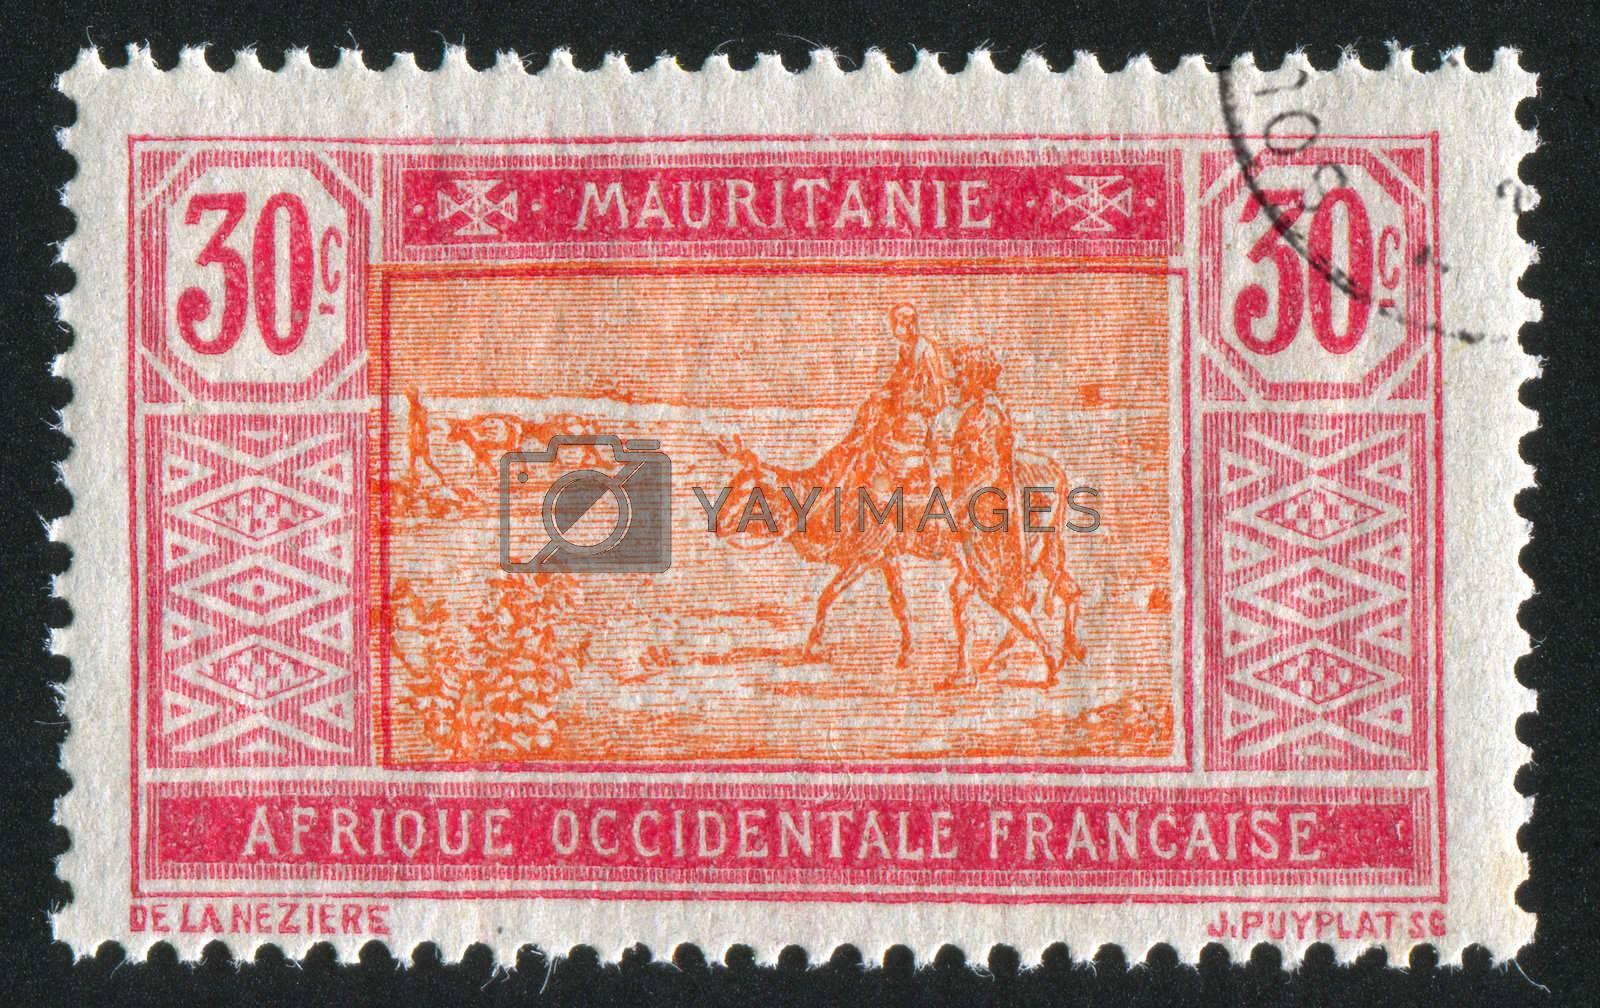 MAURITANIA - CIRCA 1922: stamp printed by Mauritania, shows Bedouins and animals, circa 1922